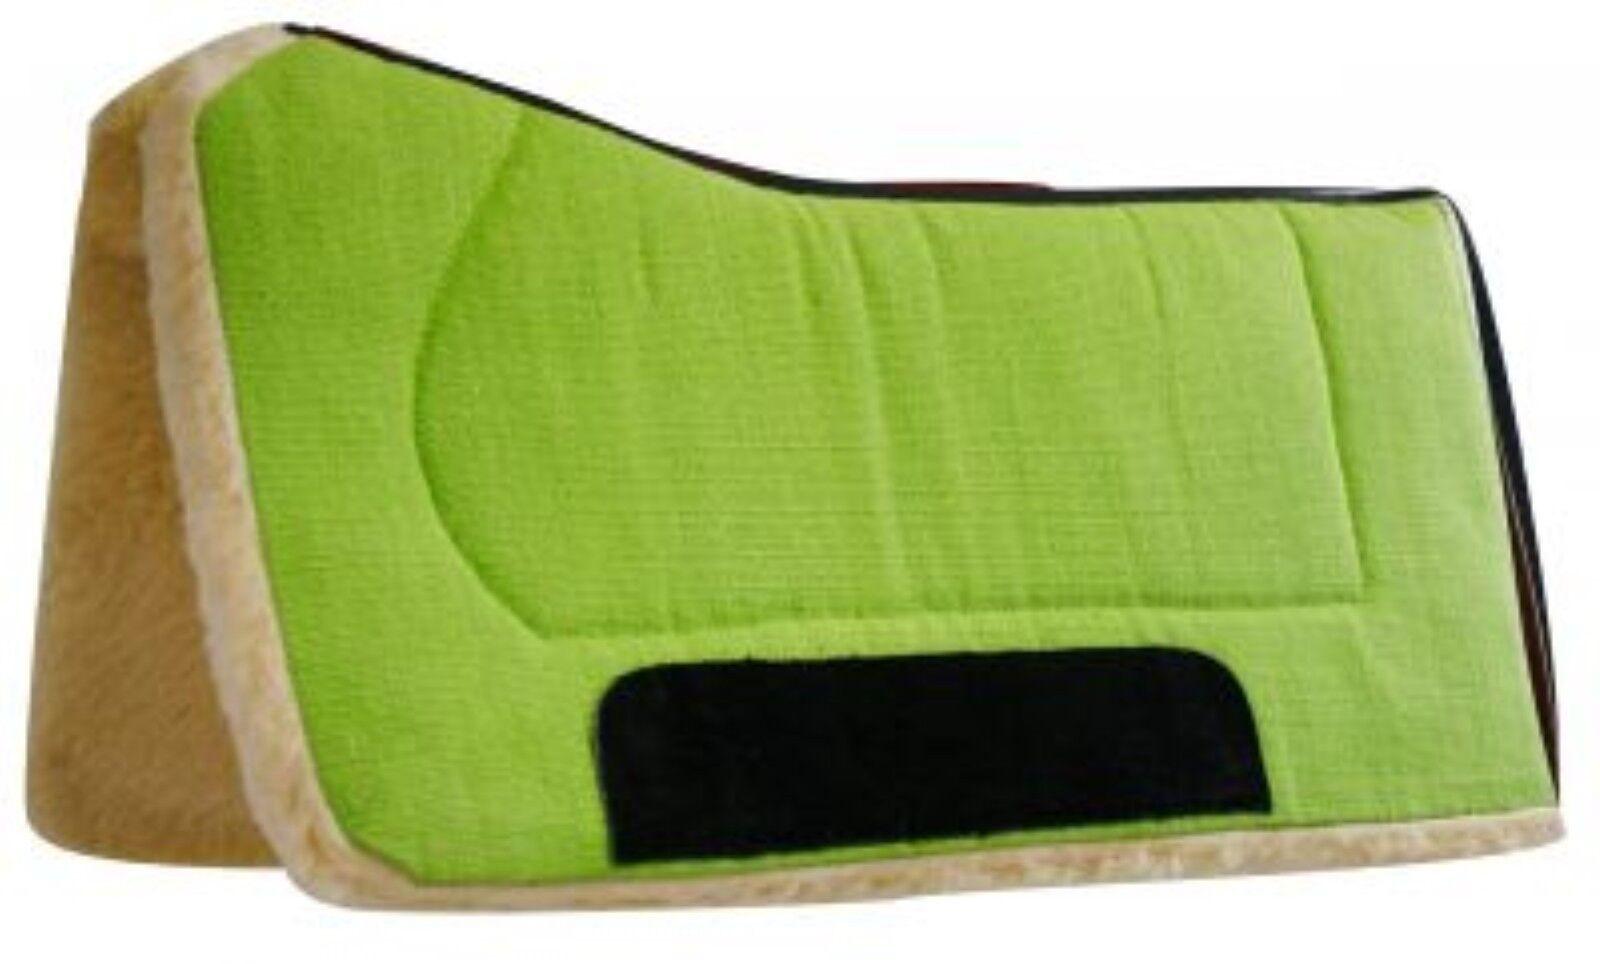 Suede Wear Leathers! Showman LIME 32x32 Contoured Saddle Pad with Felt Bottom